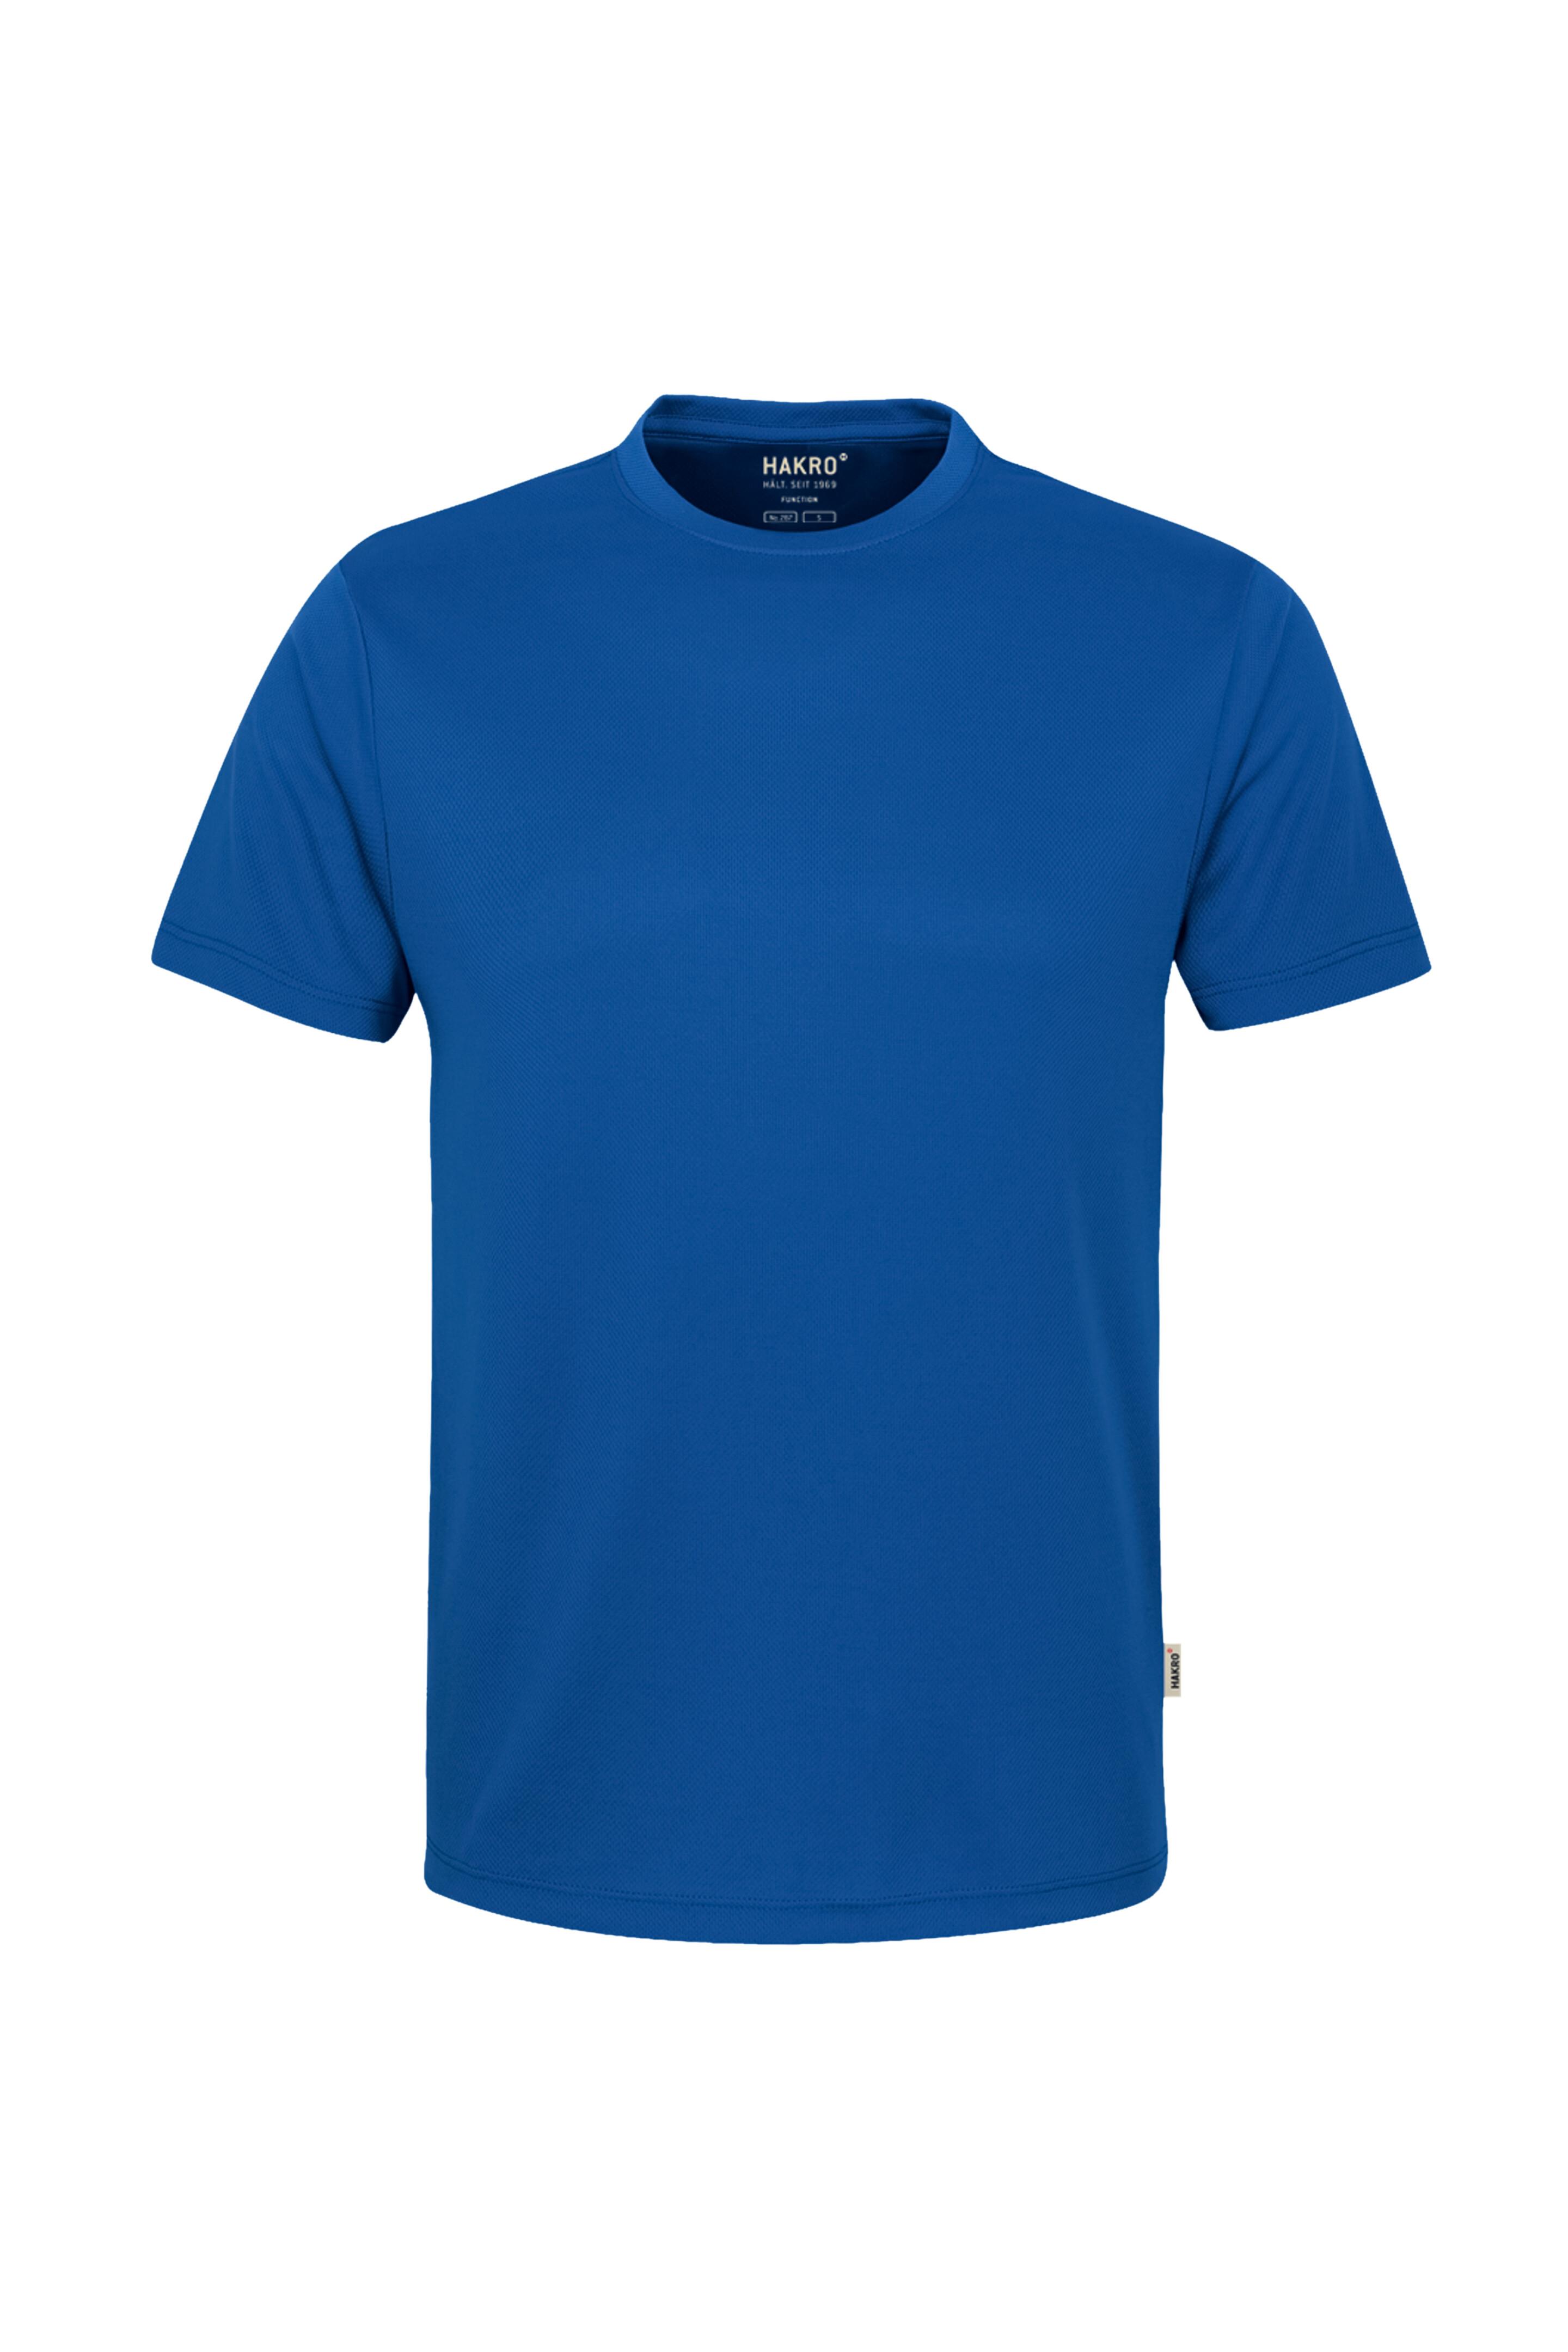 HAKRO T-Shirt COOLMAX NO. 287